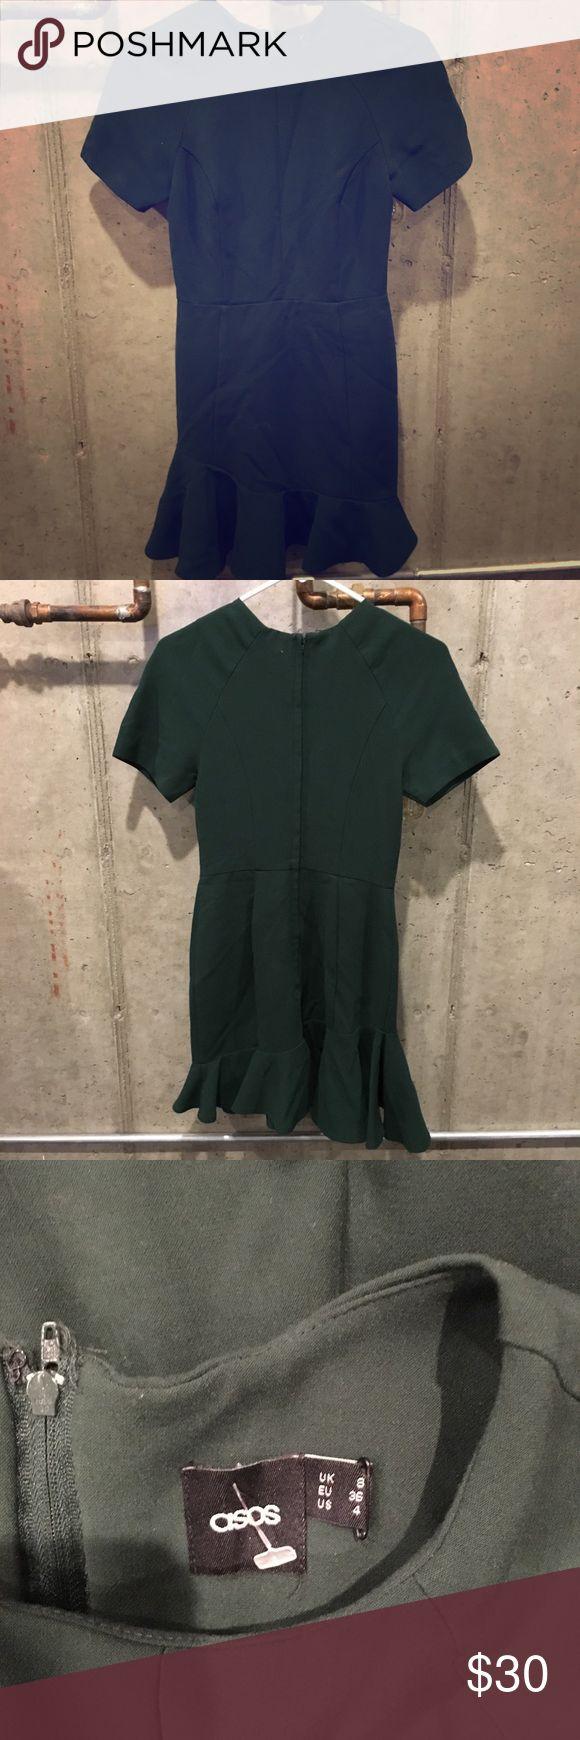 ASOS green work dress Dark green short sleeve dress with a flare on the bottom. ASOS Dresses Midi